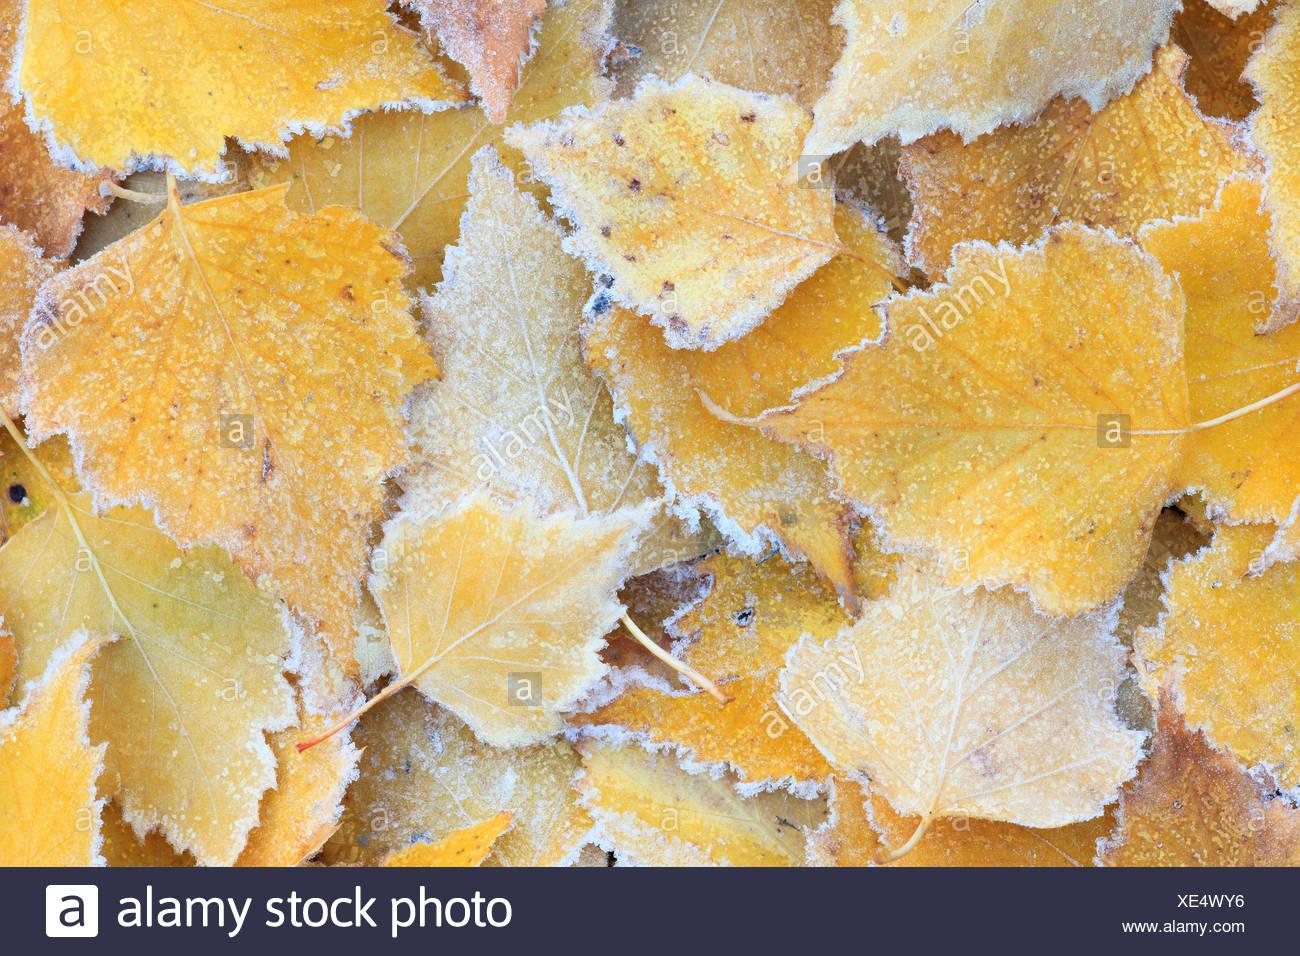 Detail, birch, birches, birch sheet, birch sheets, nature, hoarfrost - Stock Image